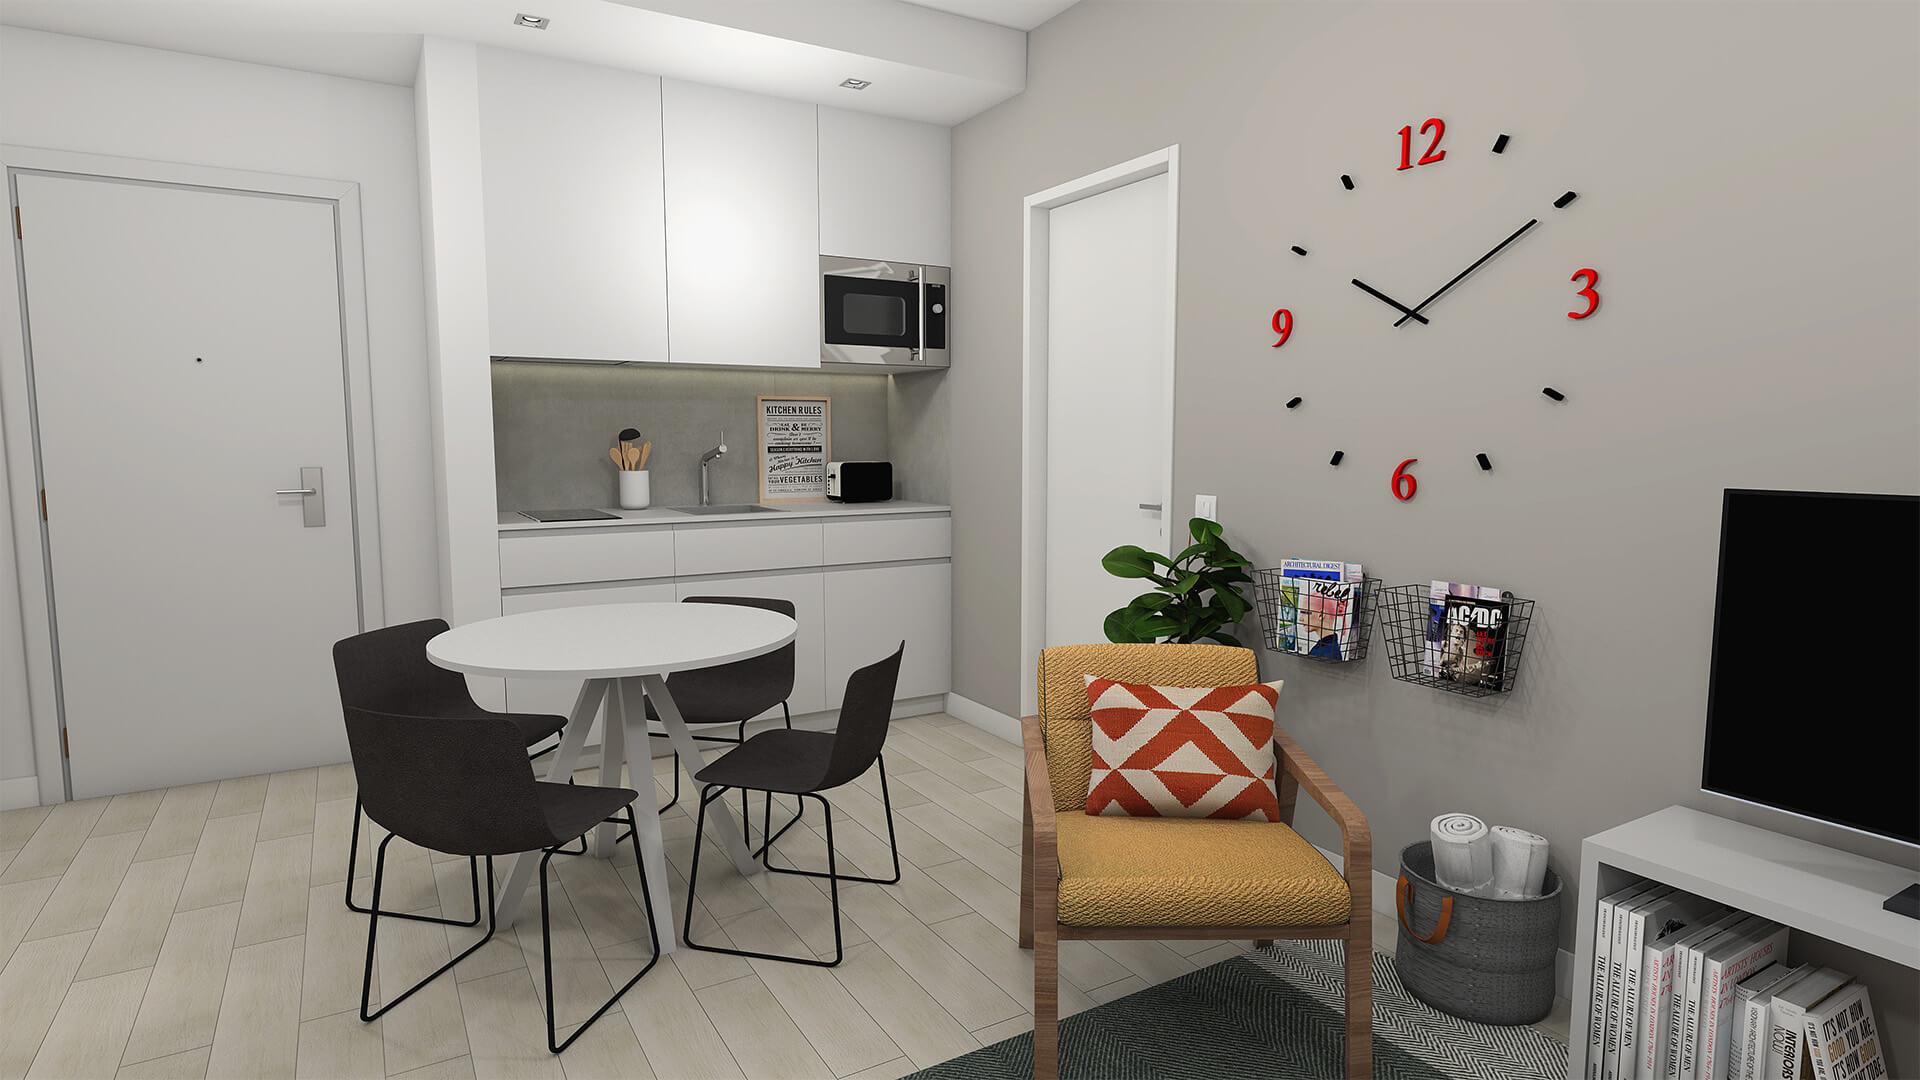 T2 - Frente Cozinha - U-LOFT Braga